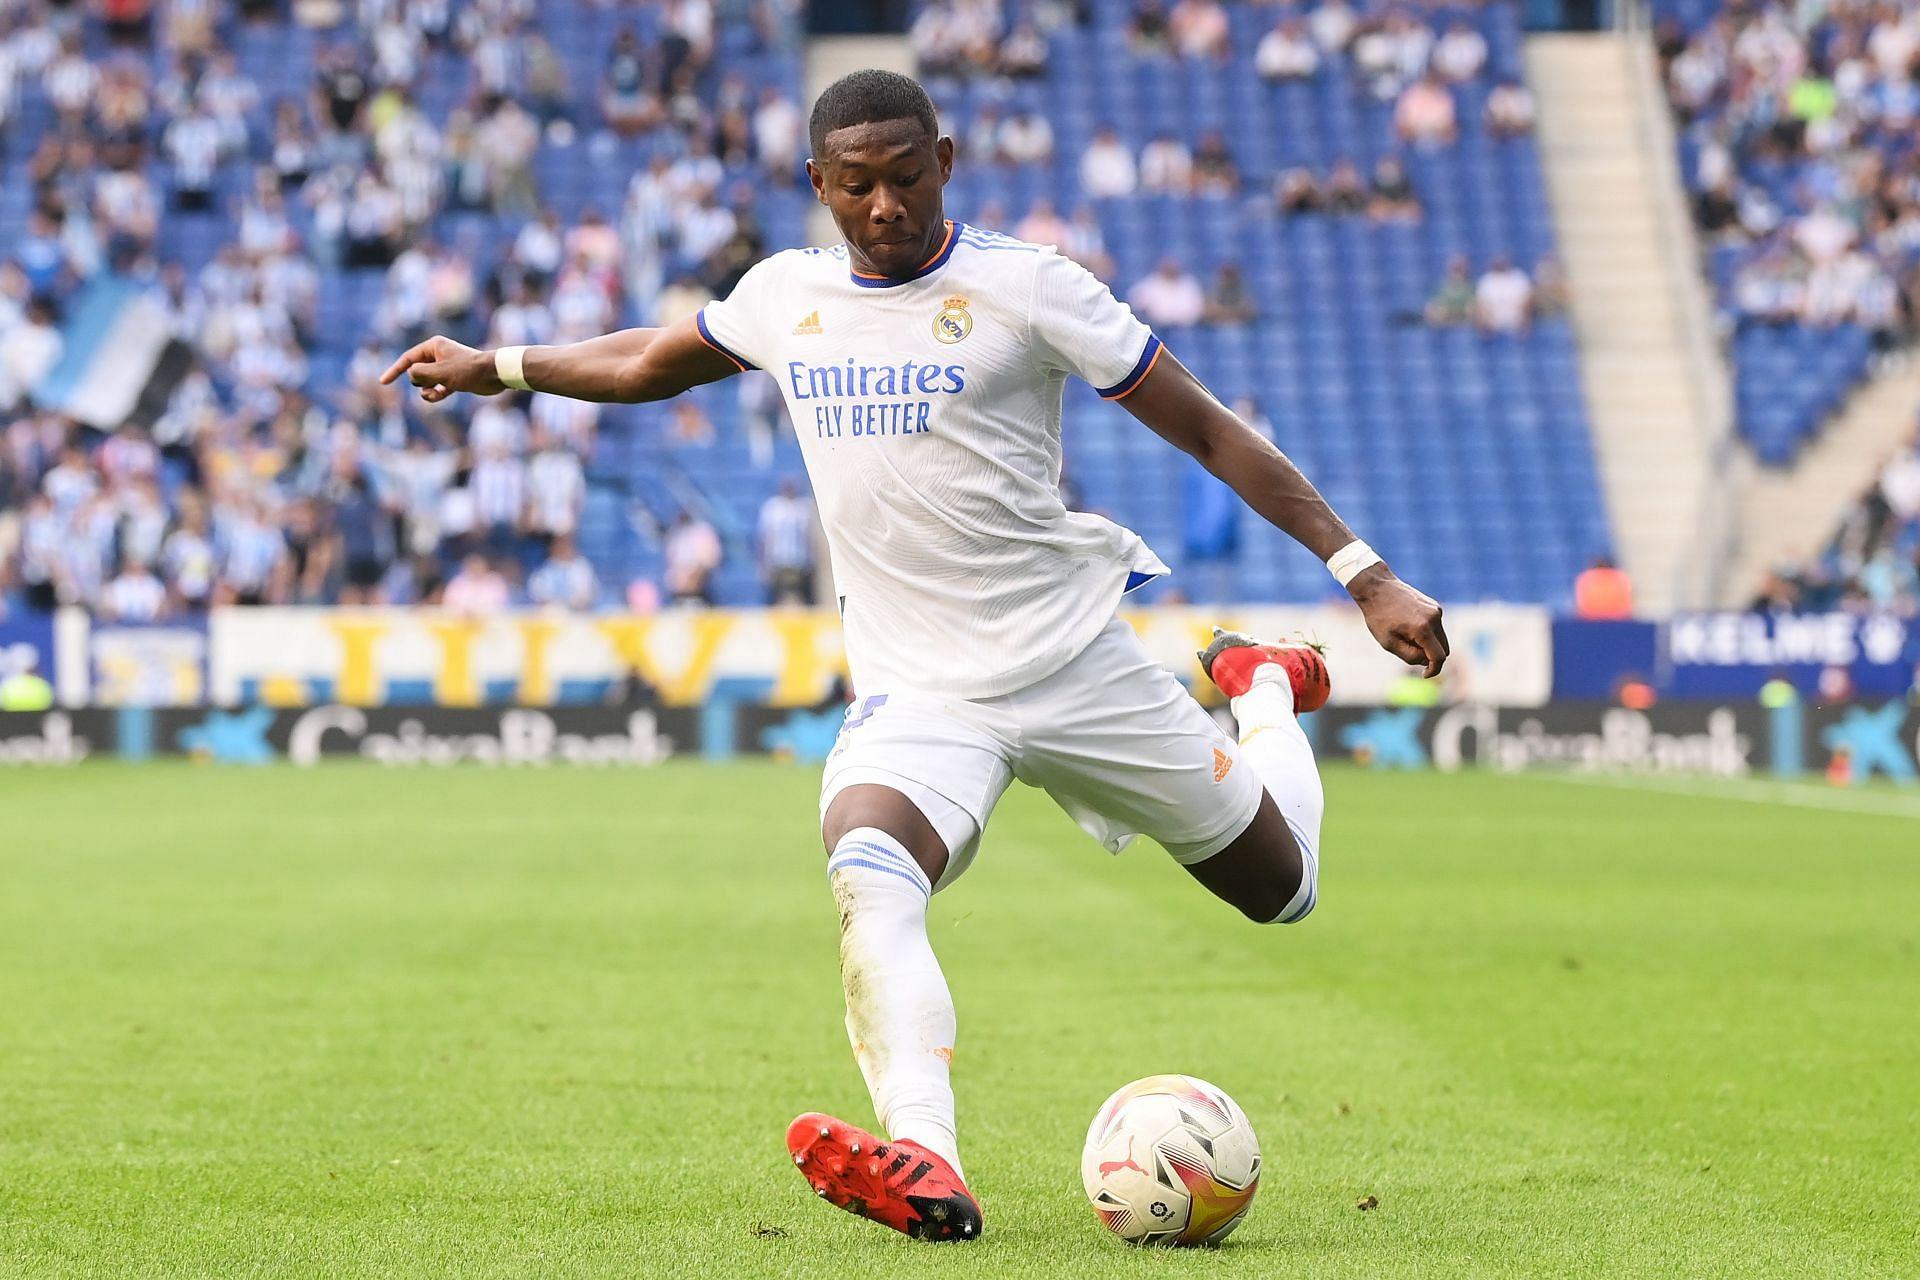 David Alaba moved to Real Madrid last summer.